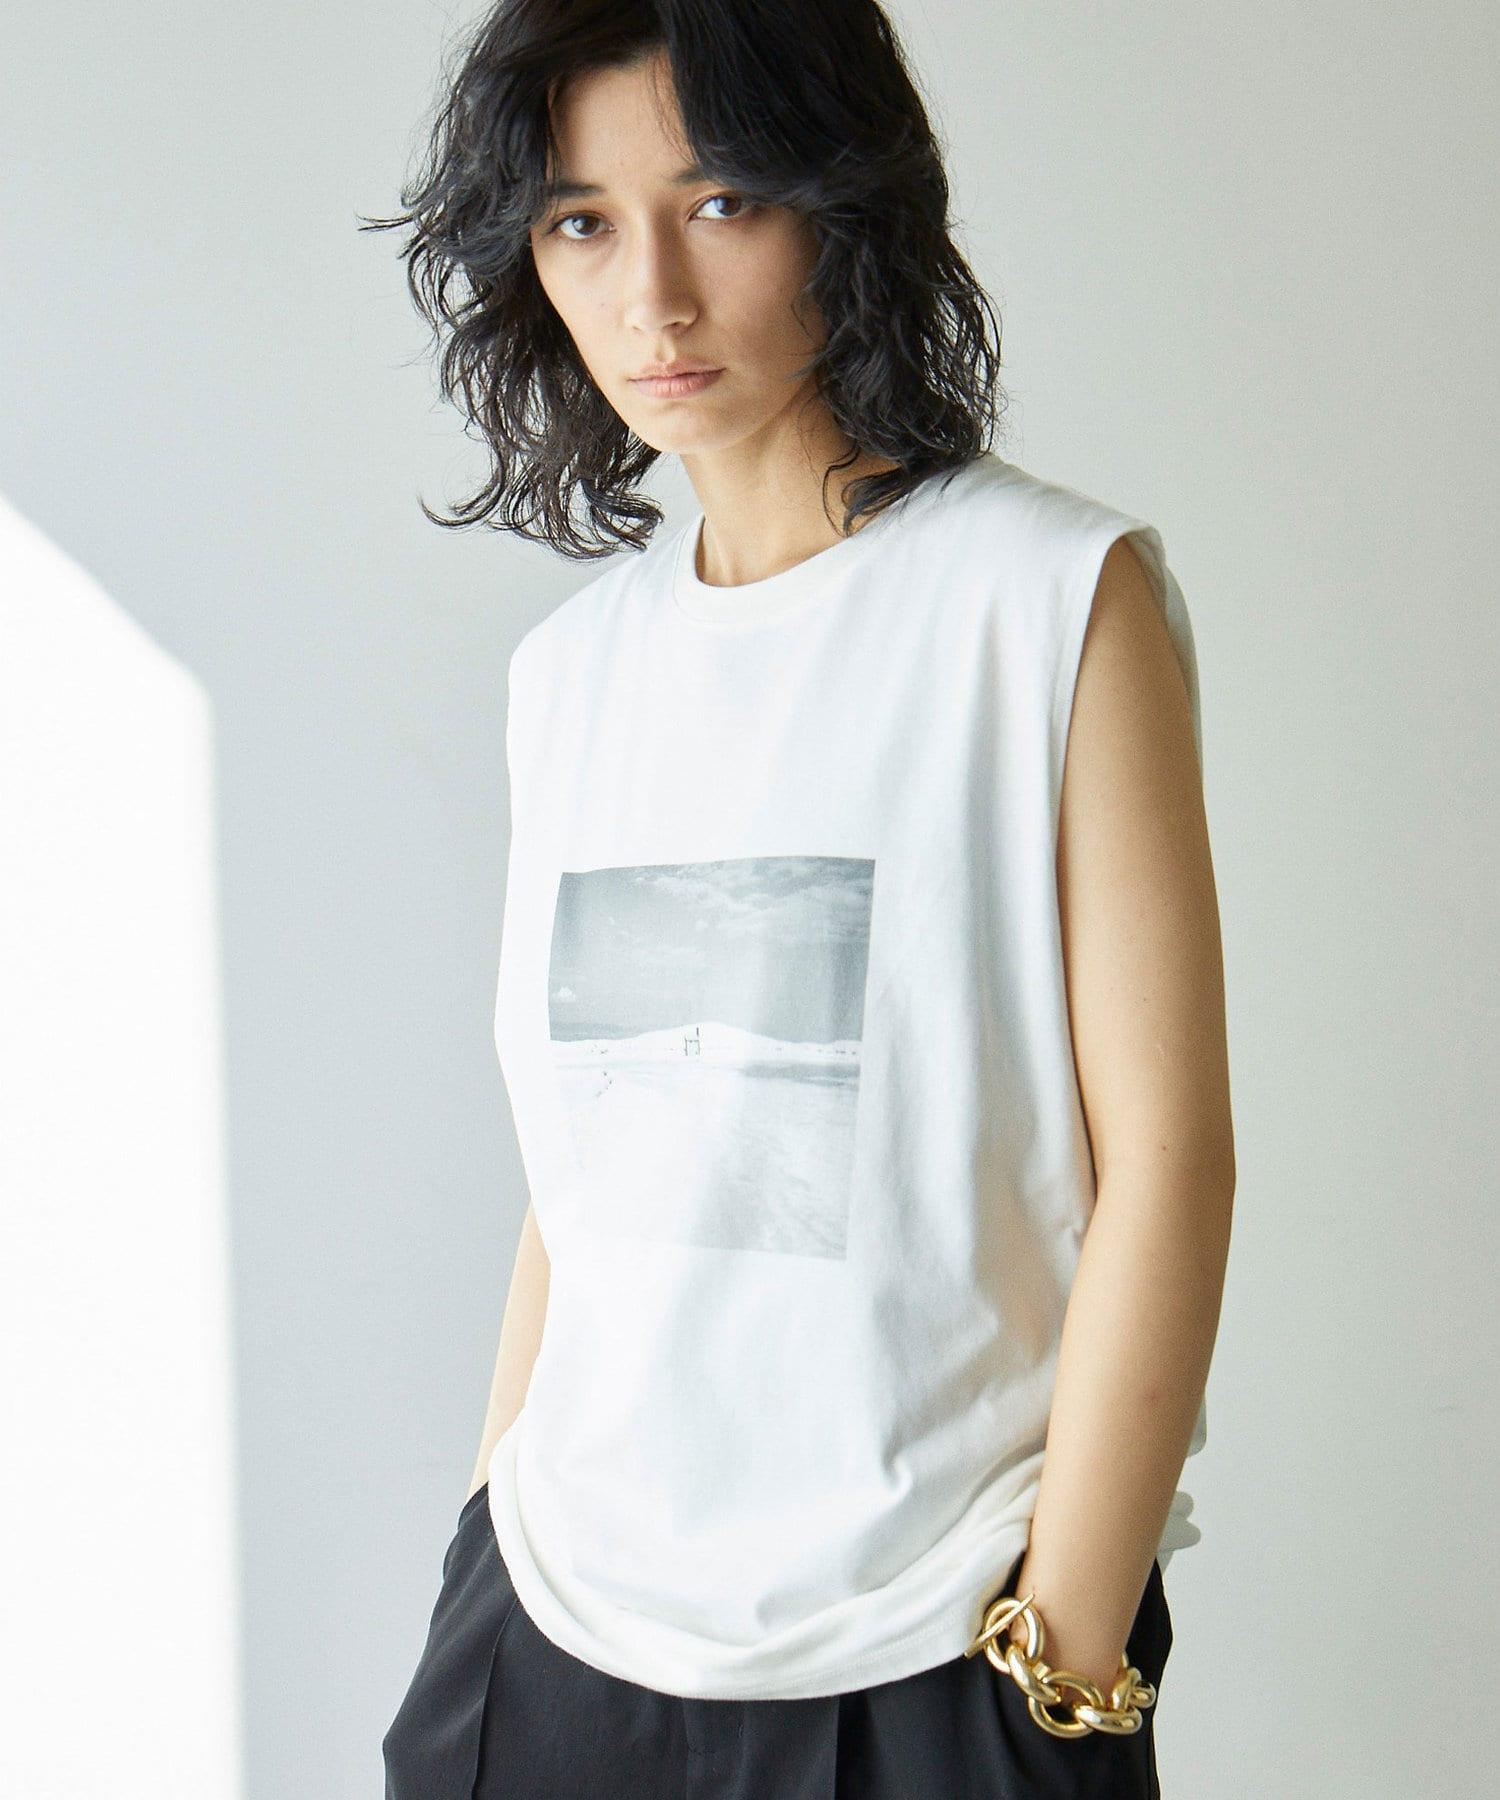 GALLARDAGALANTE(ガリャルダガランテ) ノースリグラフィックTシャツ